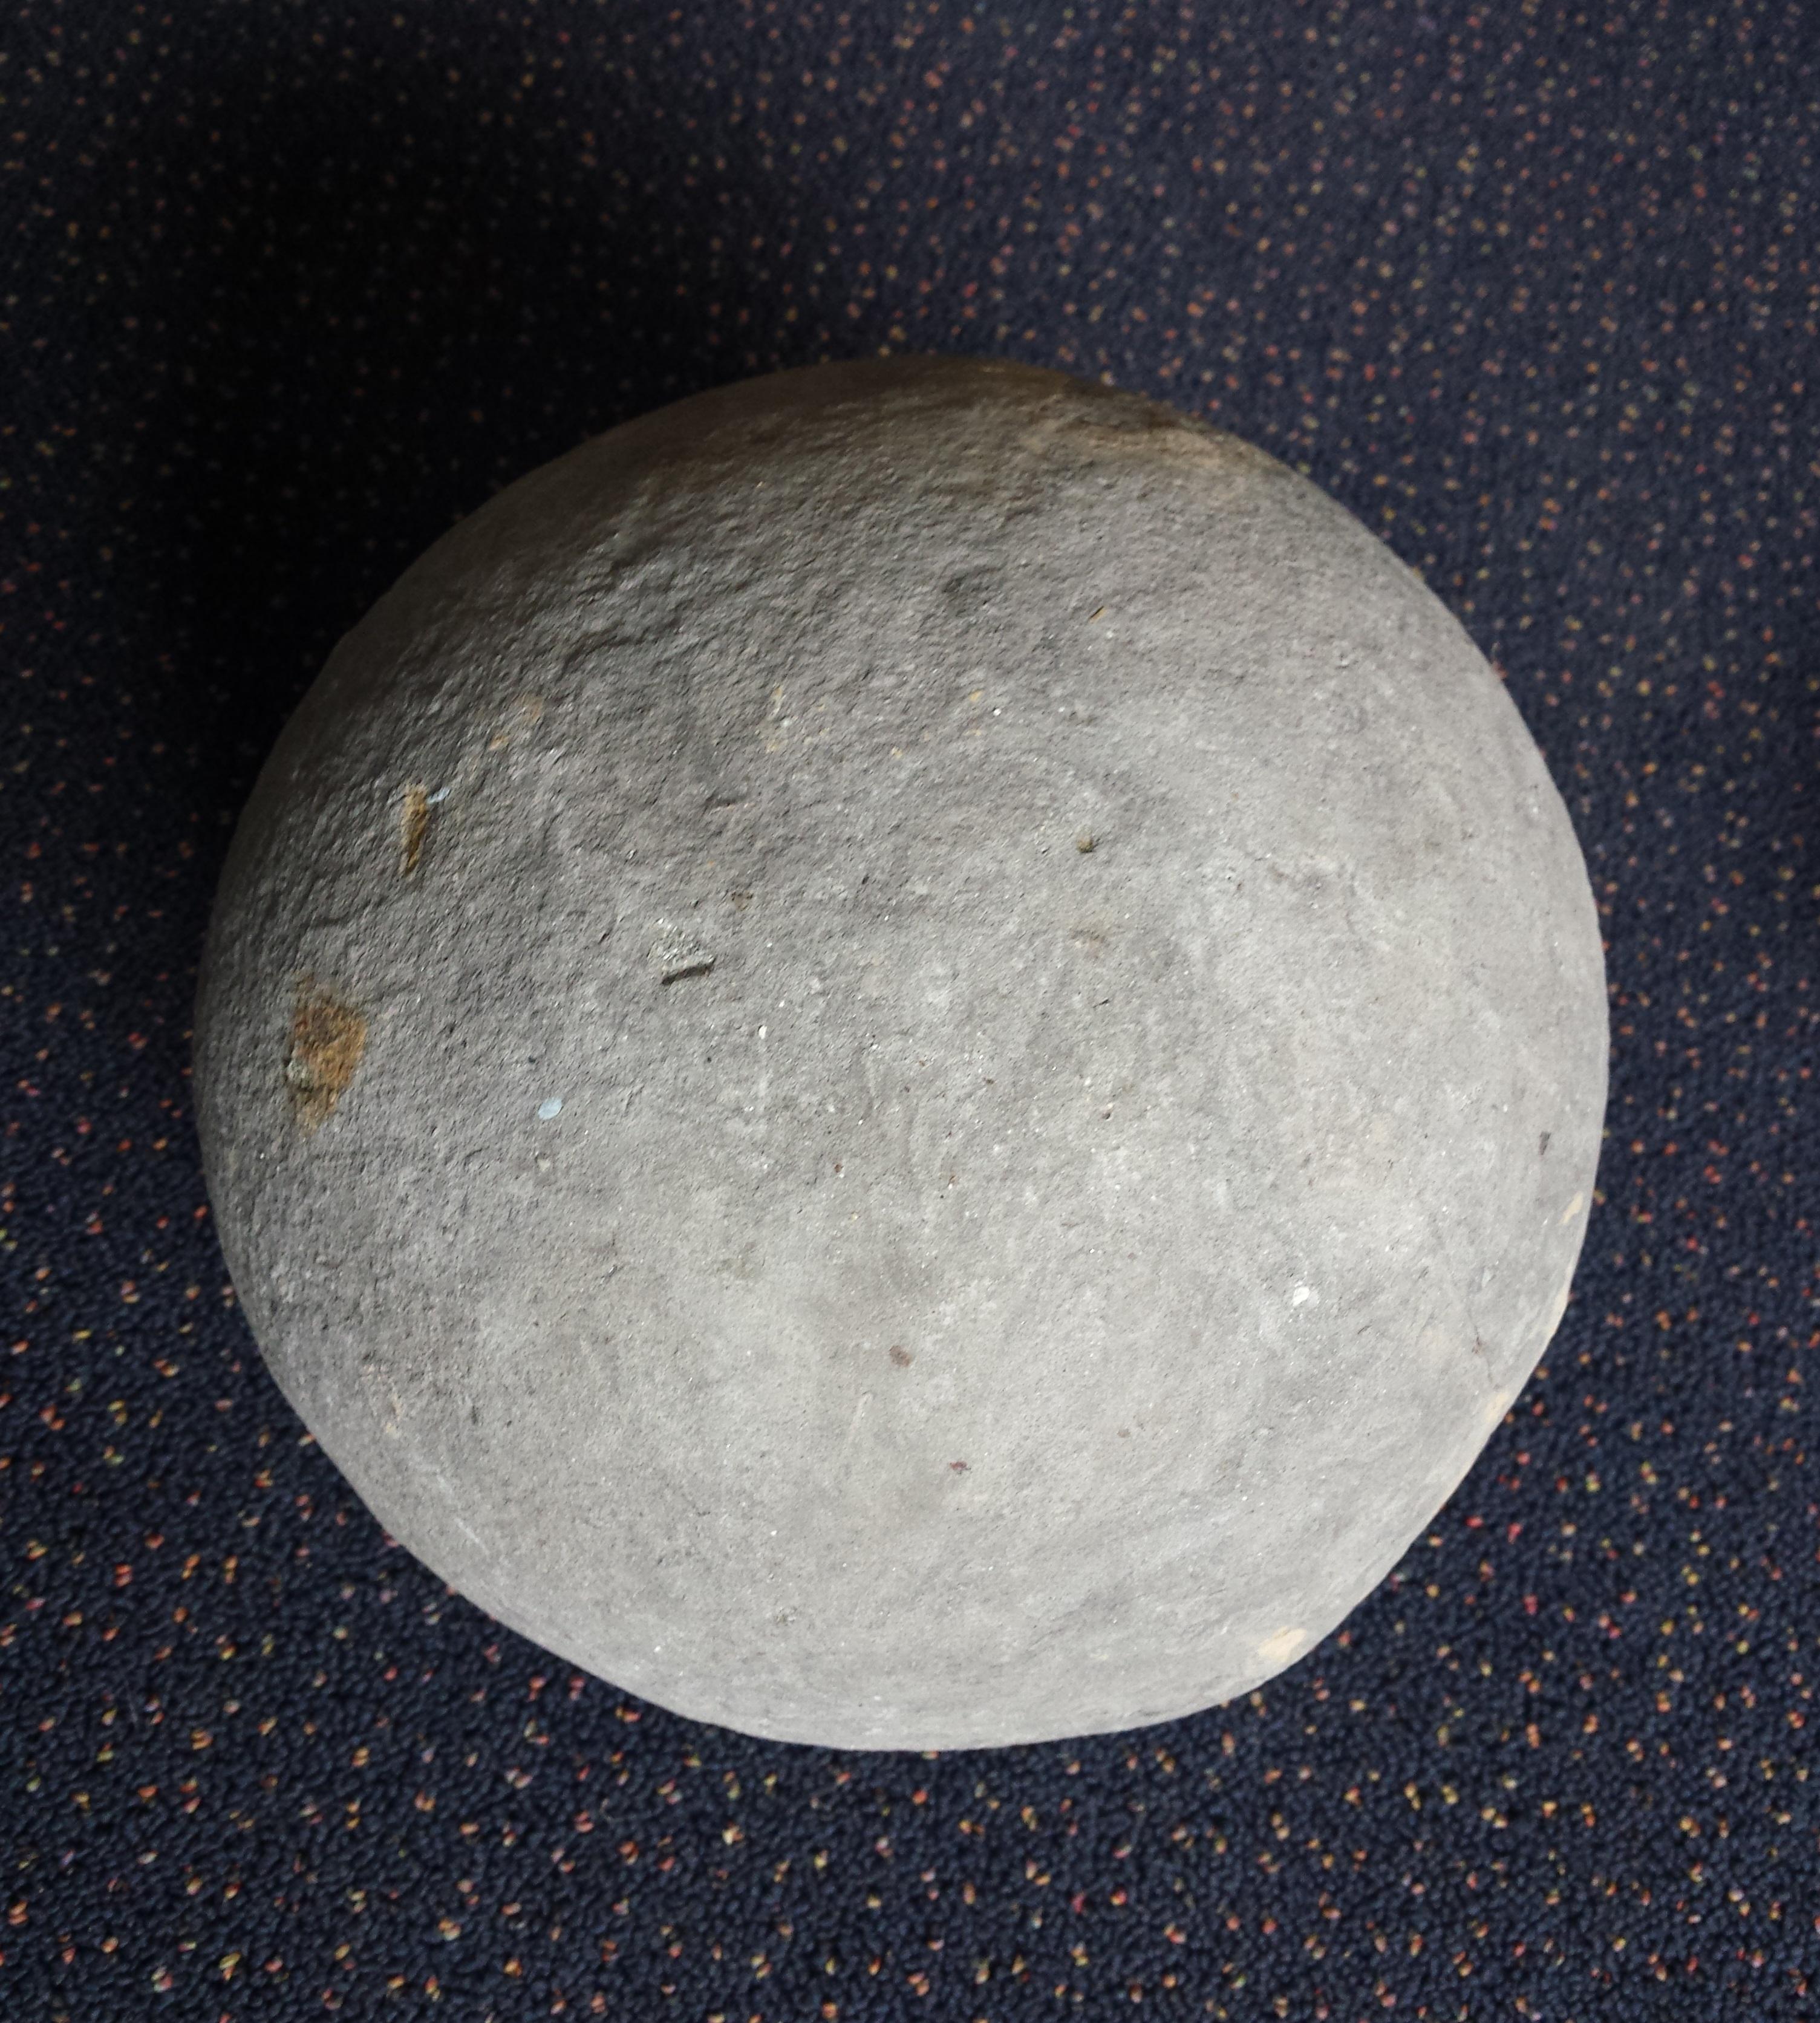 Round balls found on the barrington